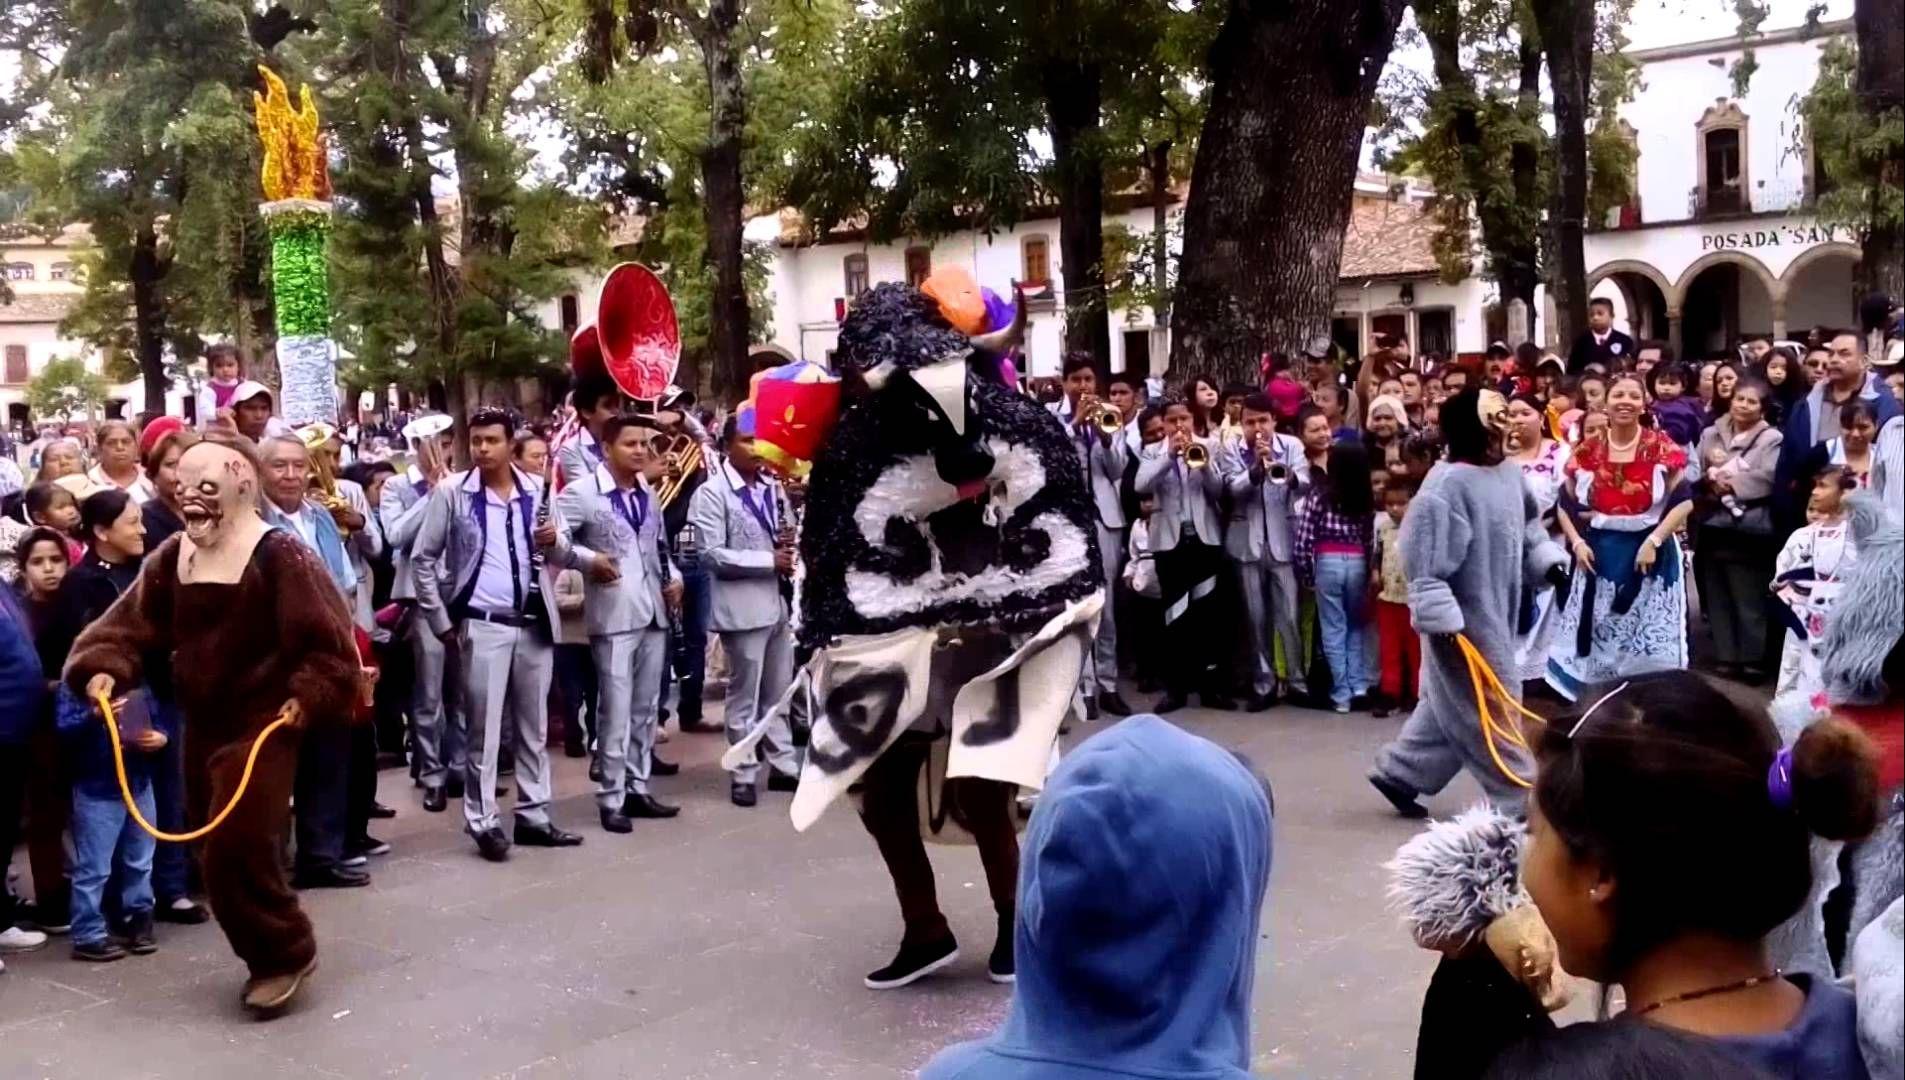 Carnaval Pátzcuaro 2020